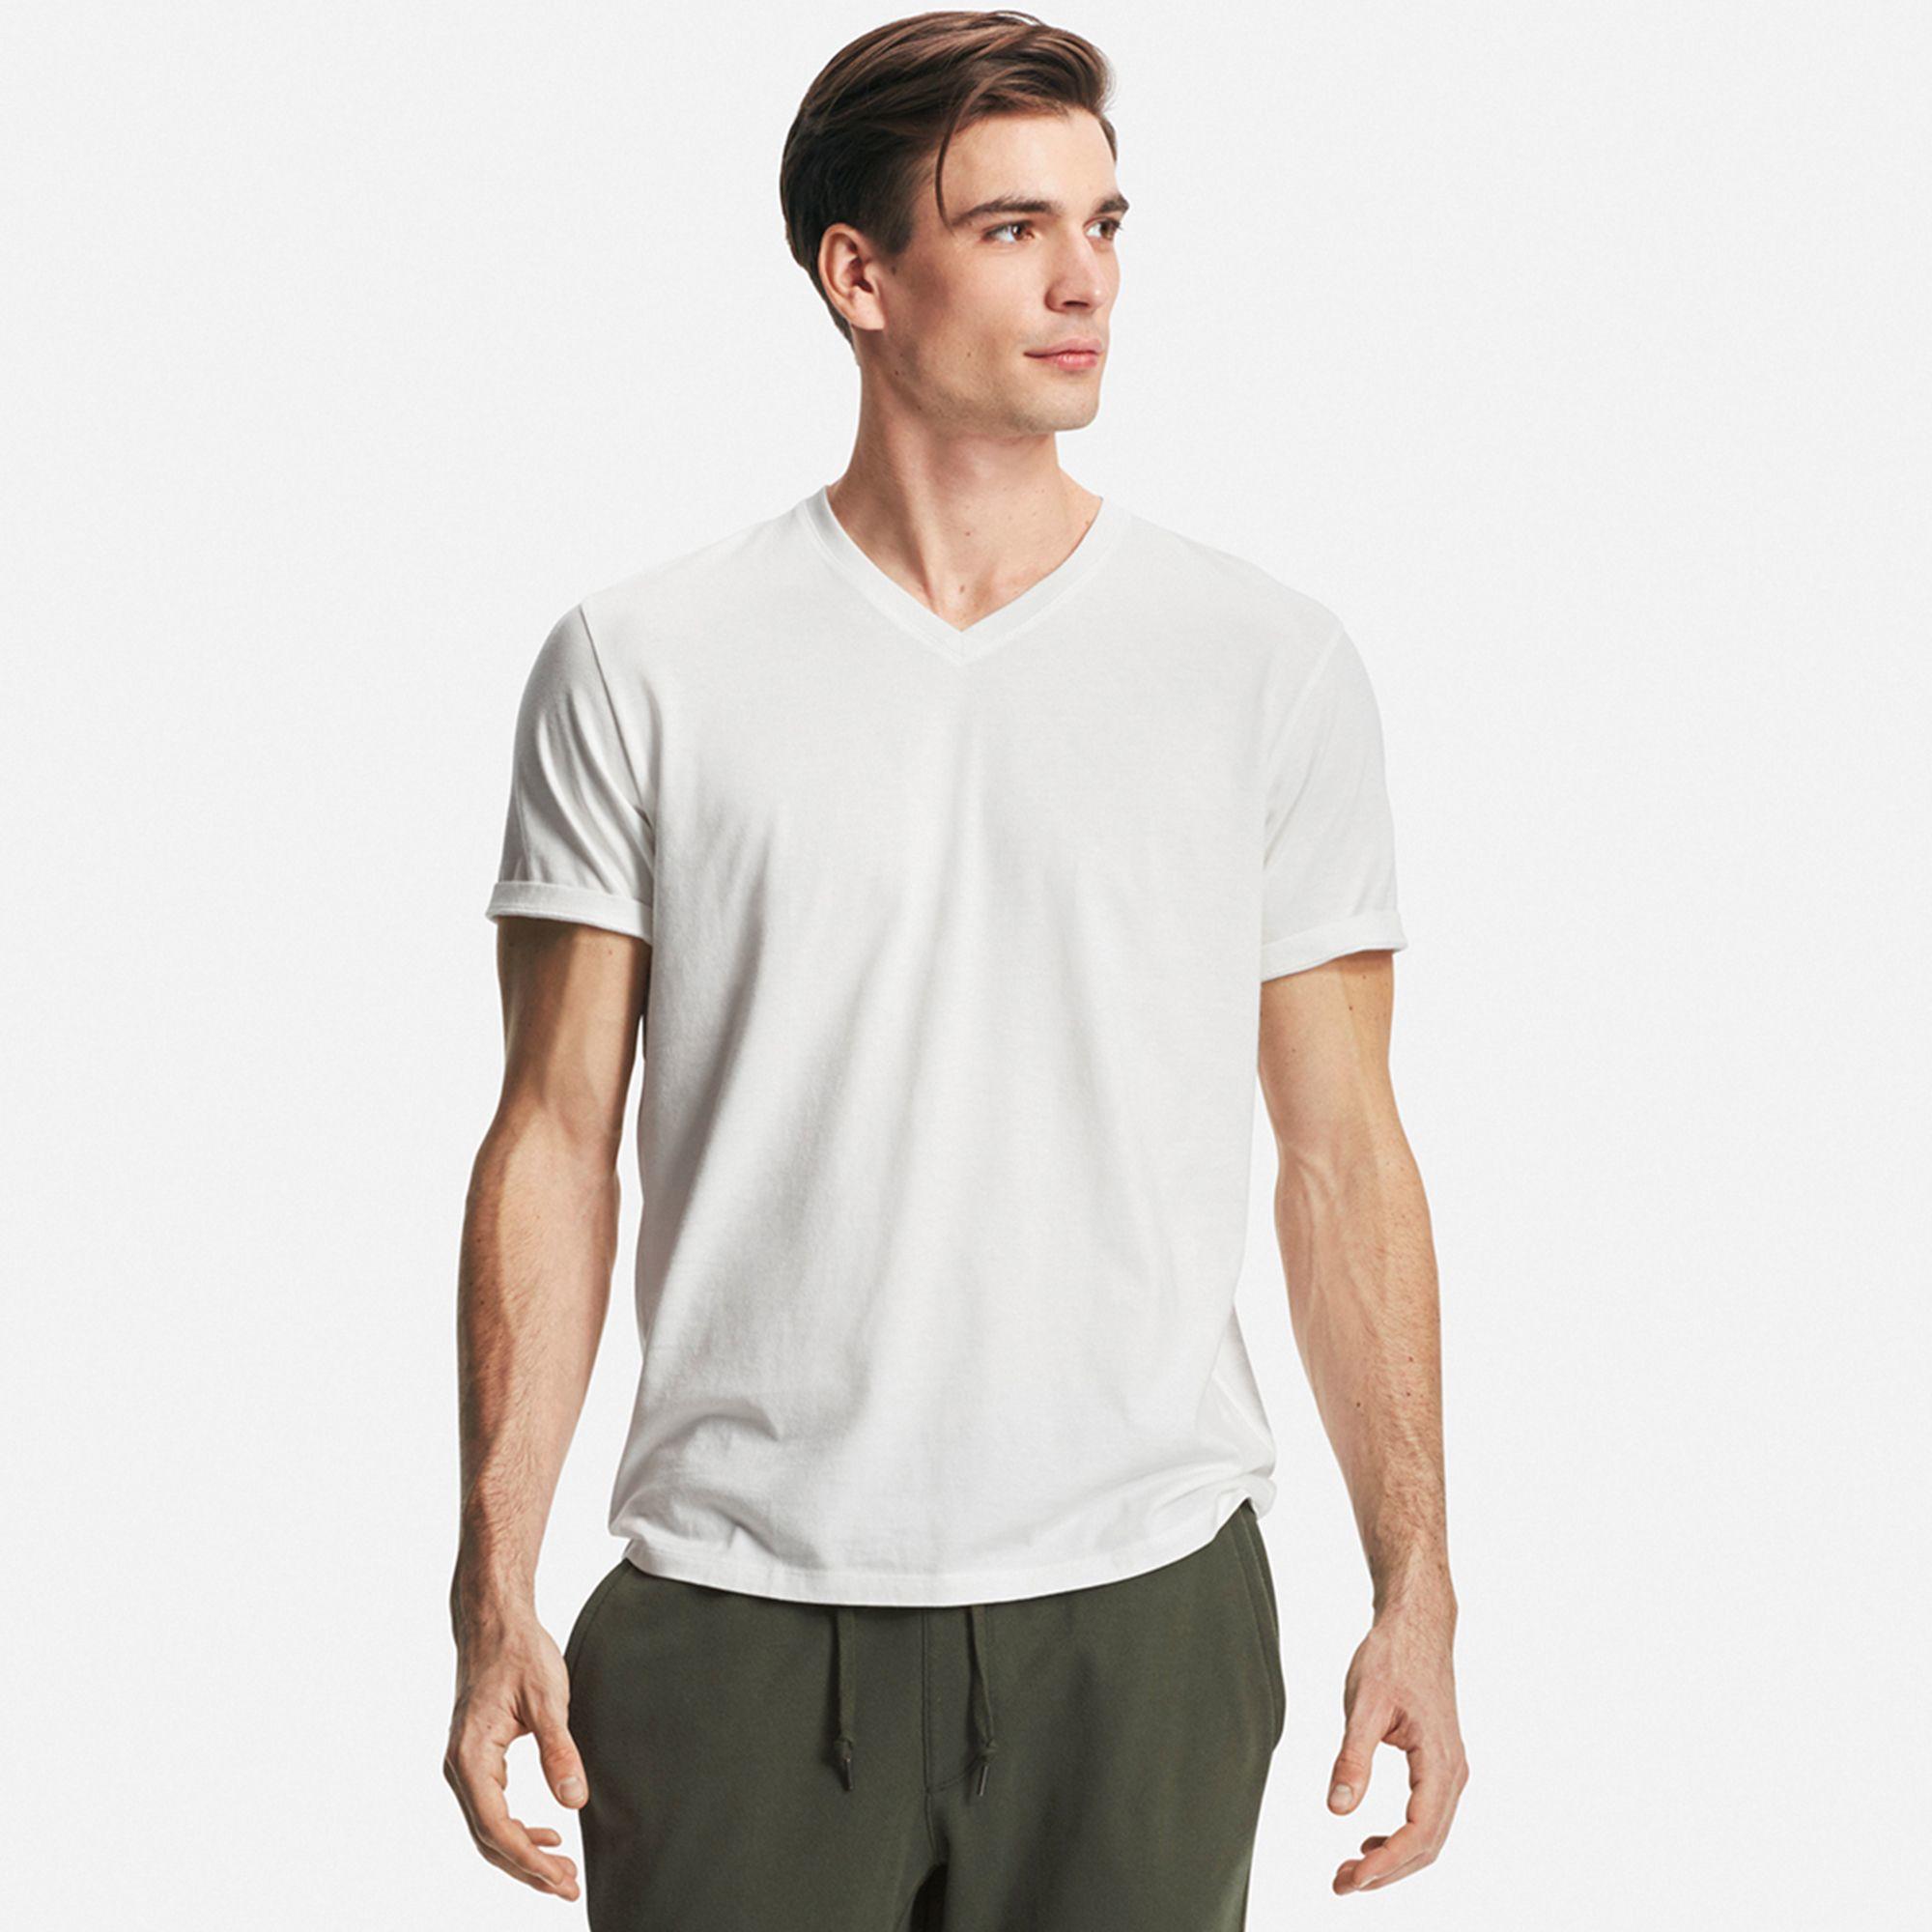 Uniqlo men 39 s supima r cotton v neck t shirt in white for for Supima cotton dress shirts